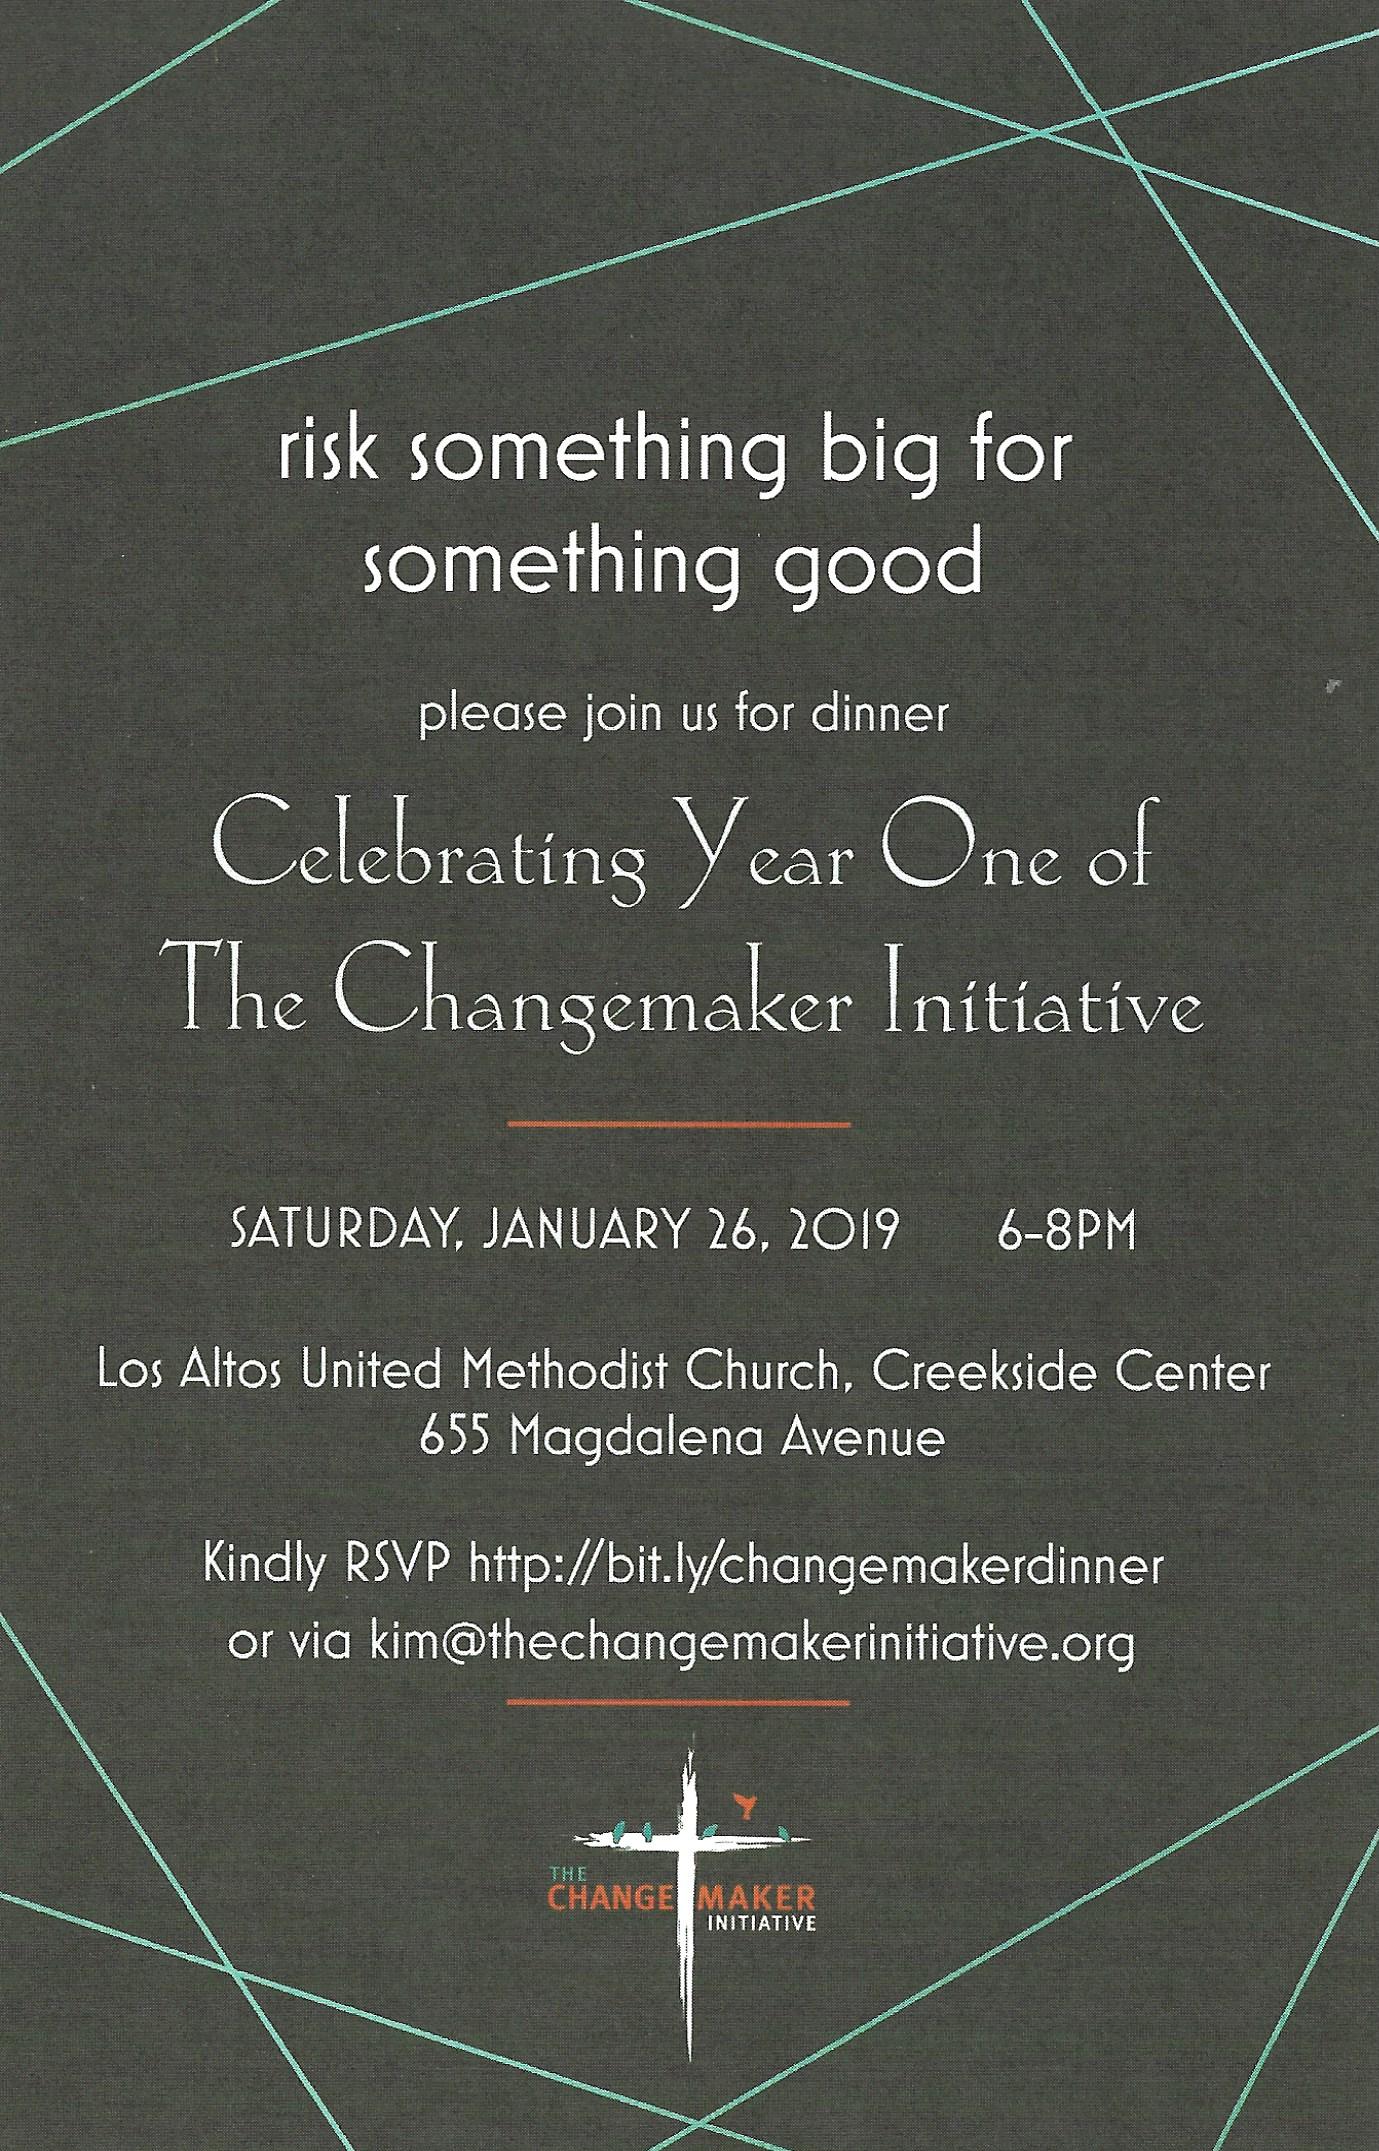 Changemaker Dinner Invitation 1.jpeg